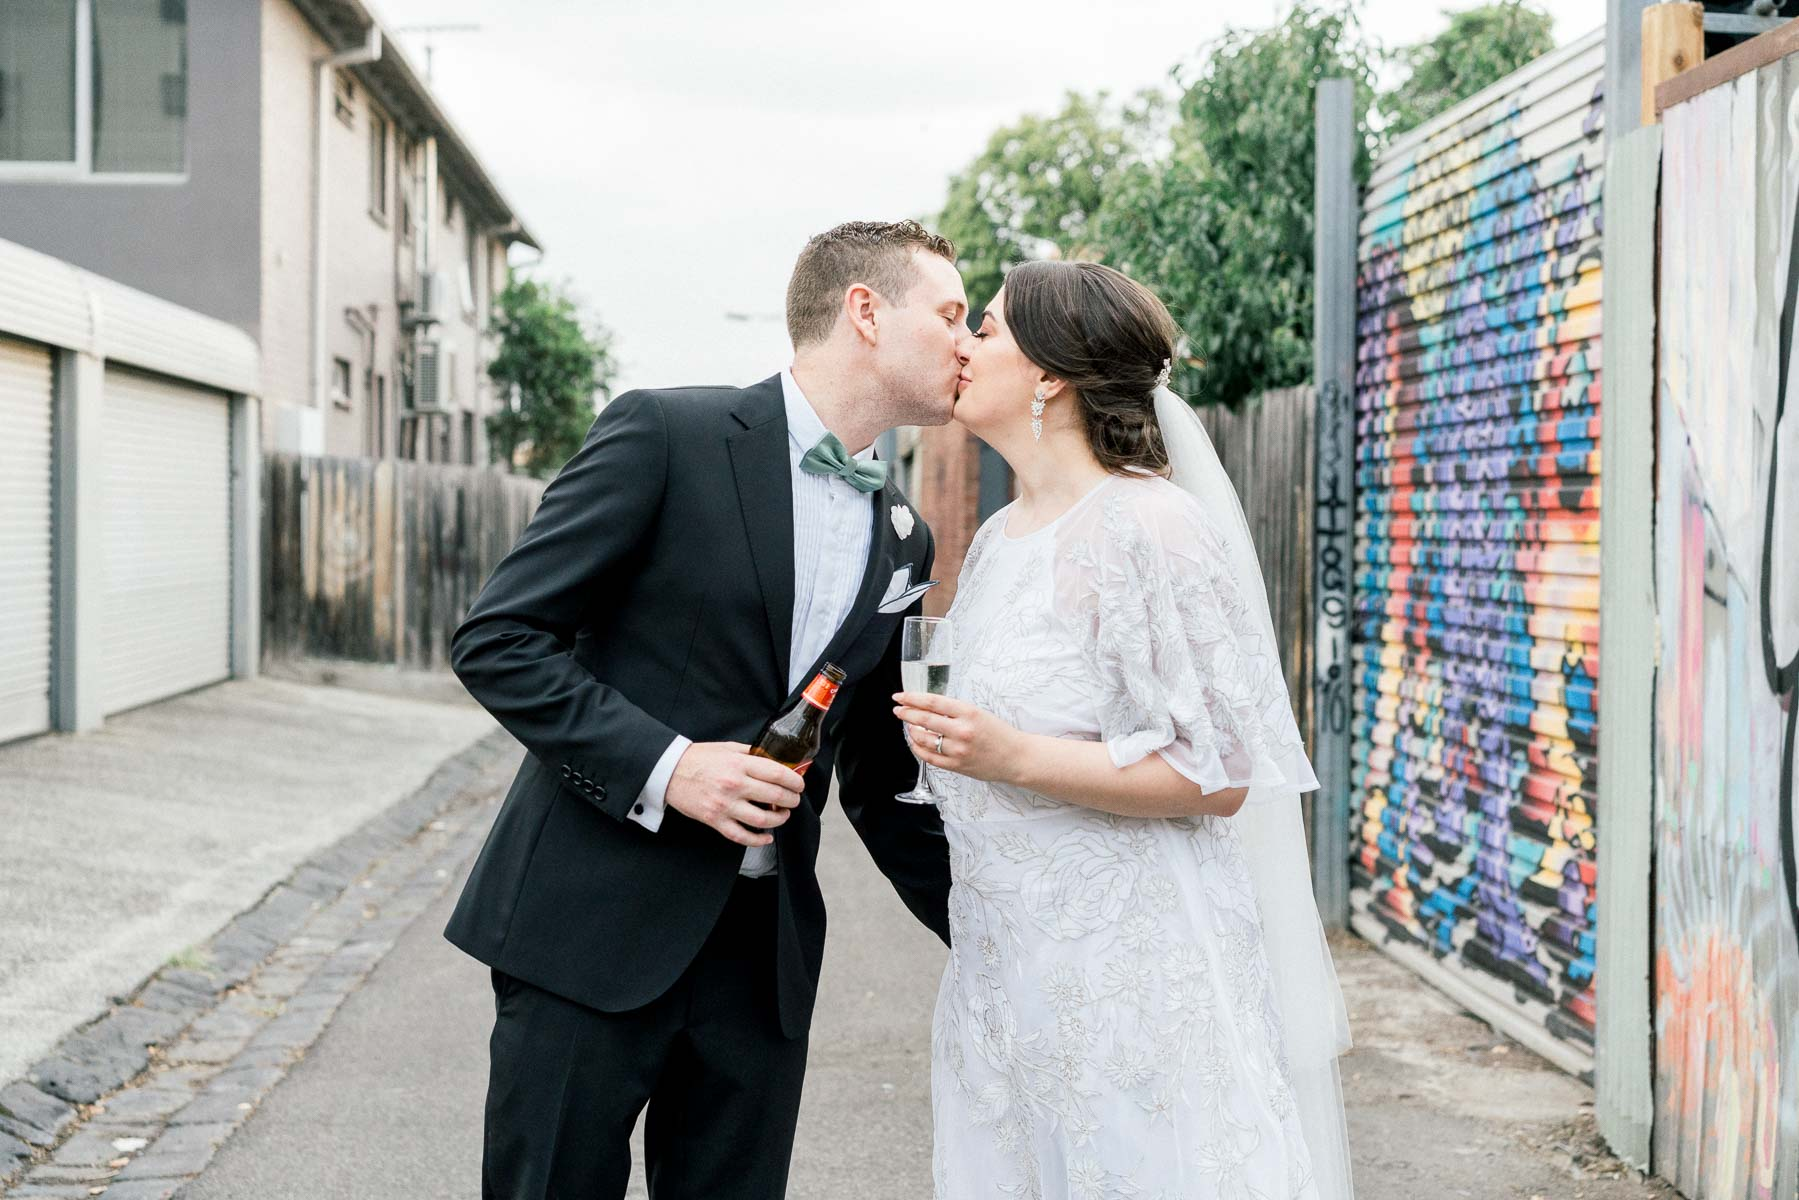 little-henri-cafe-wedding-thornbury-heart+soul-weddings-jane-aaron-05830.jpg